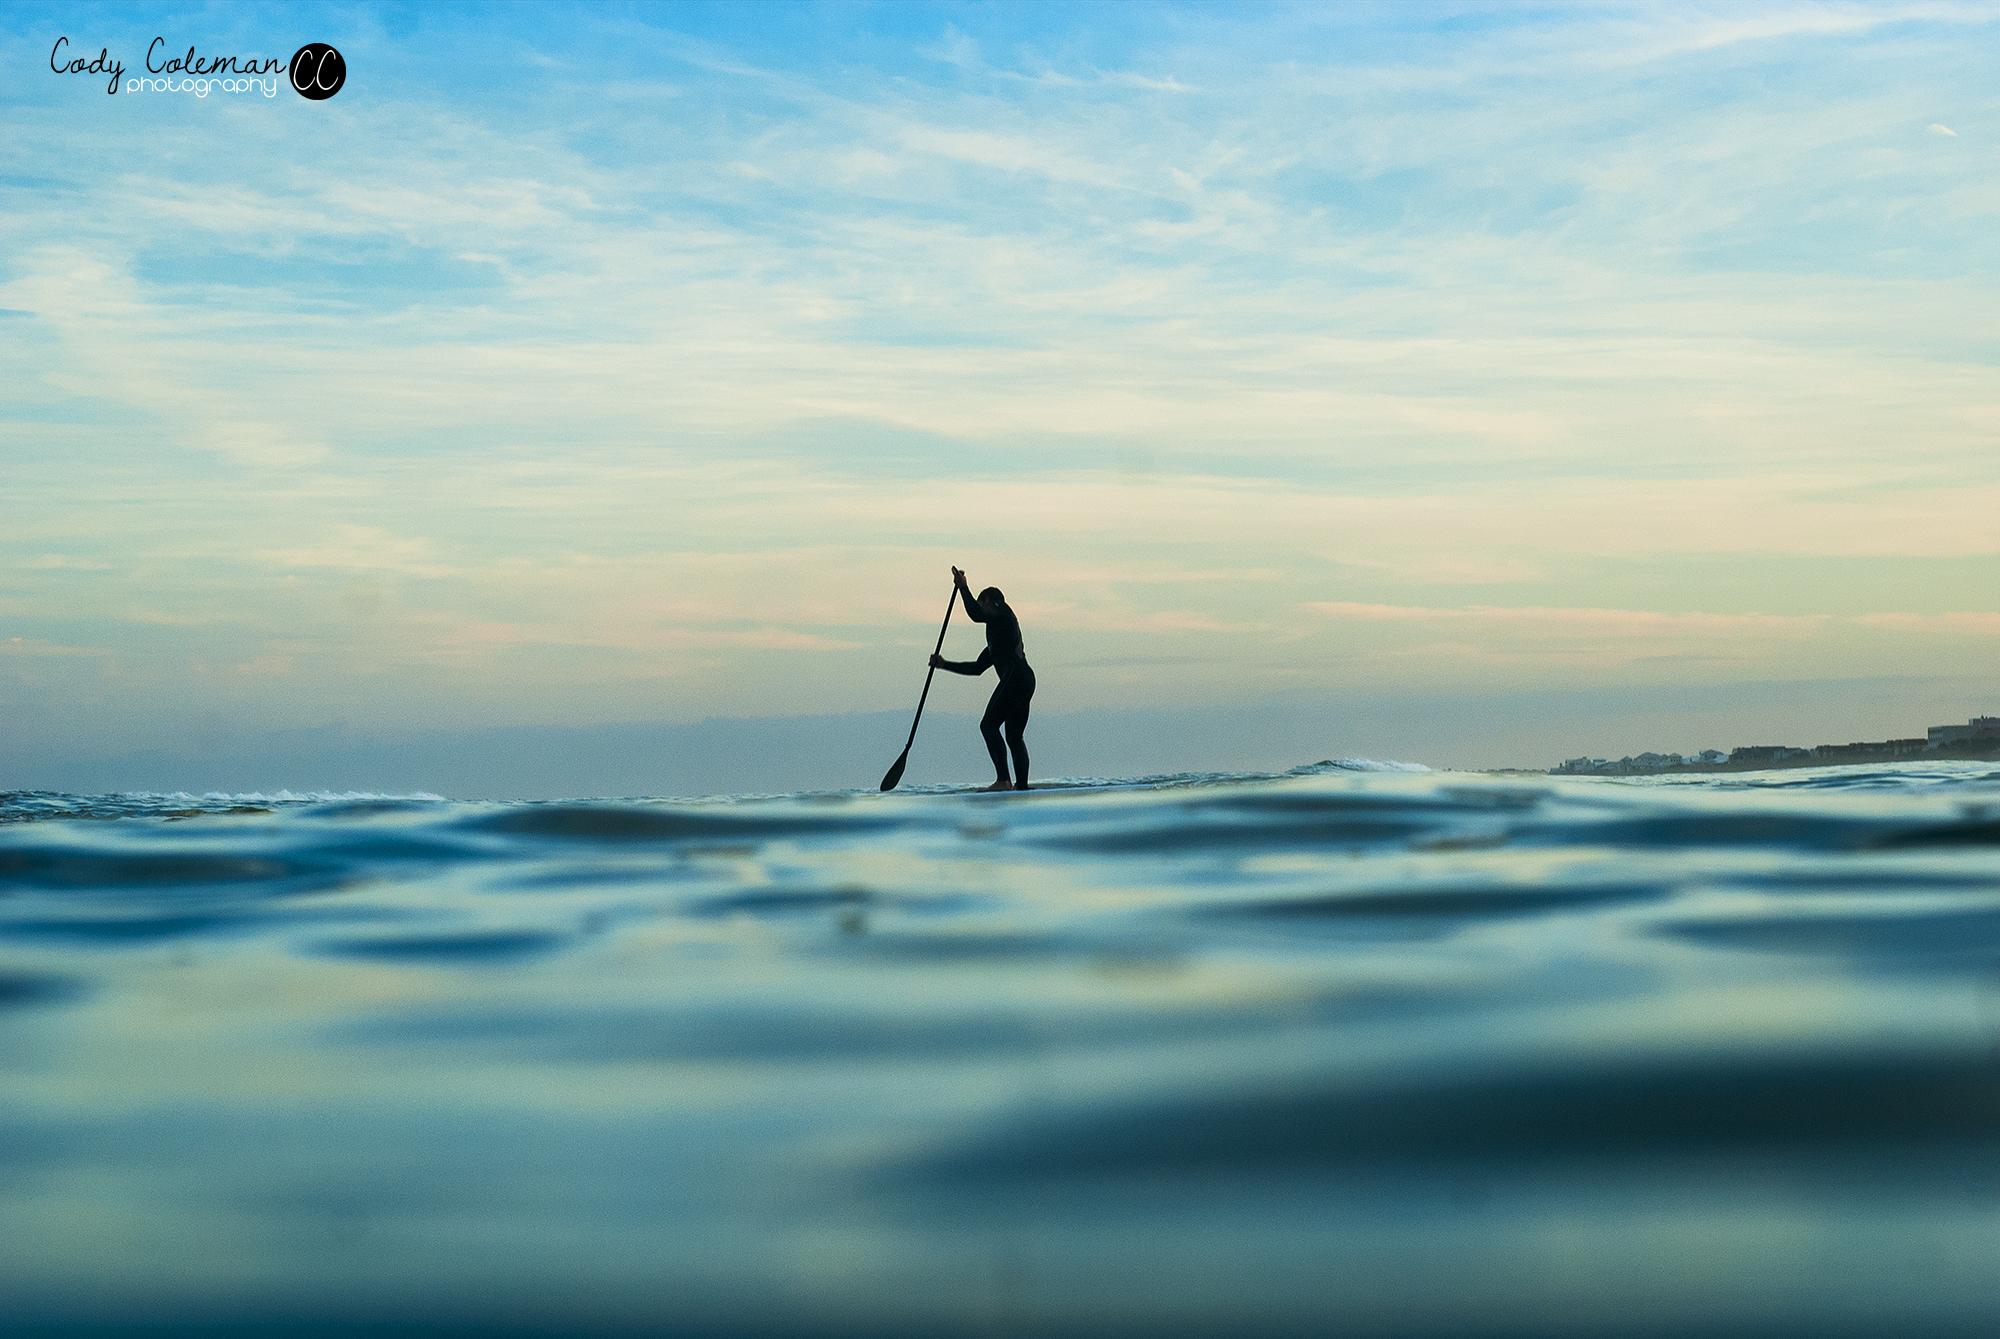 Standup_paddle_boarding